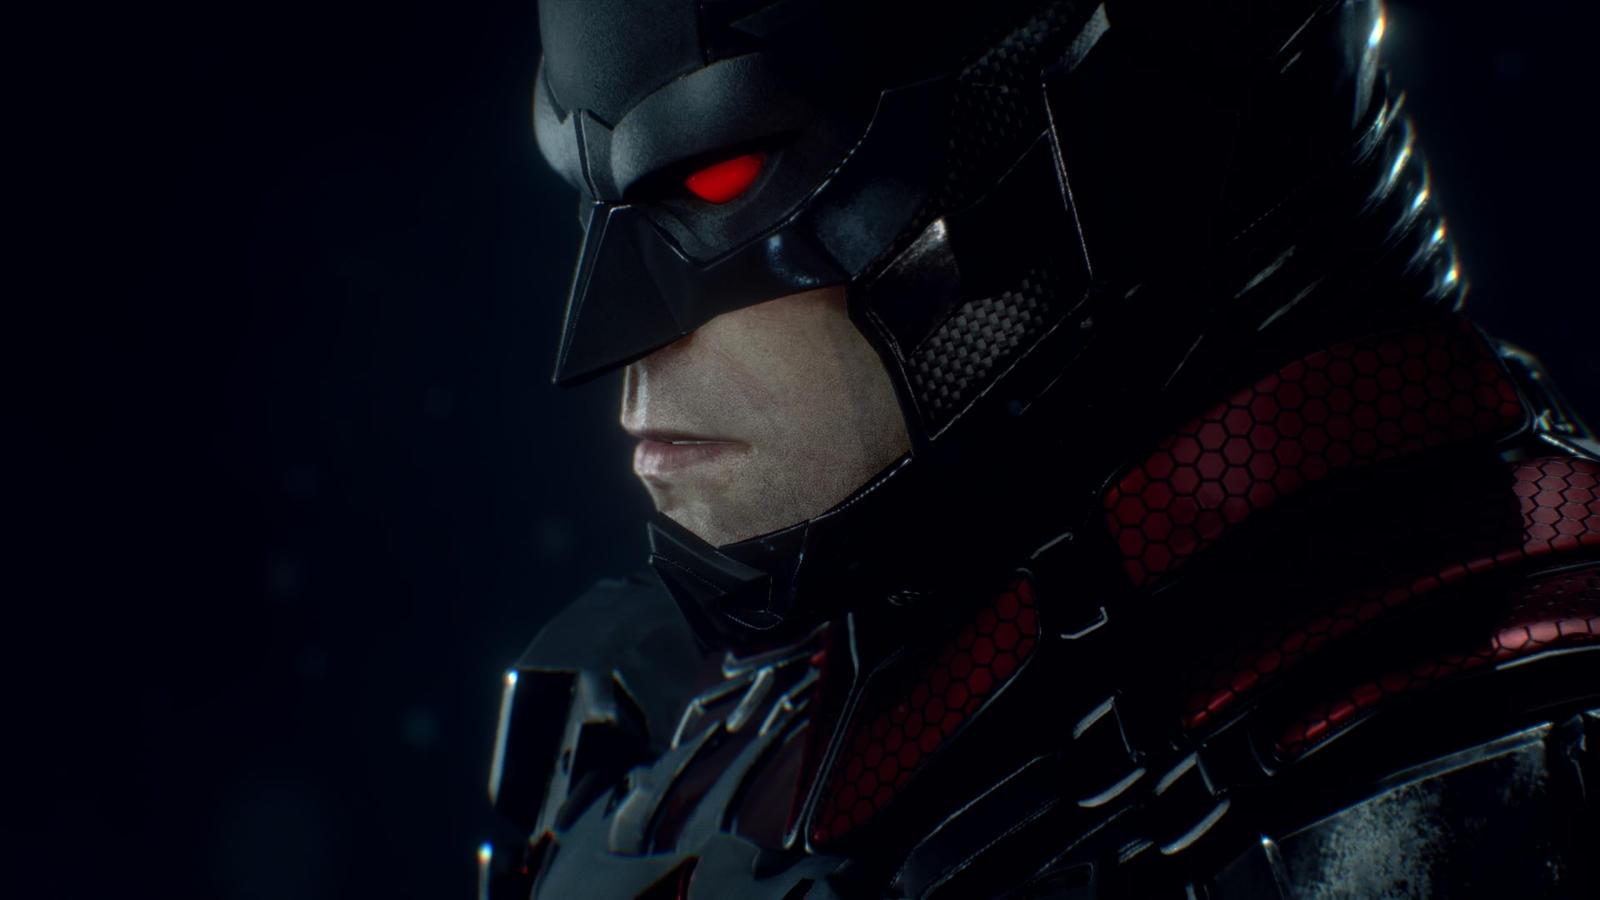 batman__arkham_knight__7_justice_league_